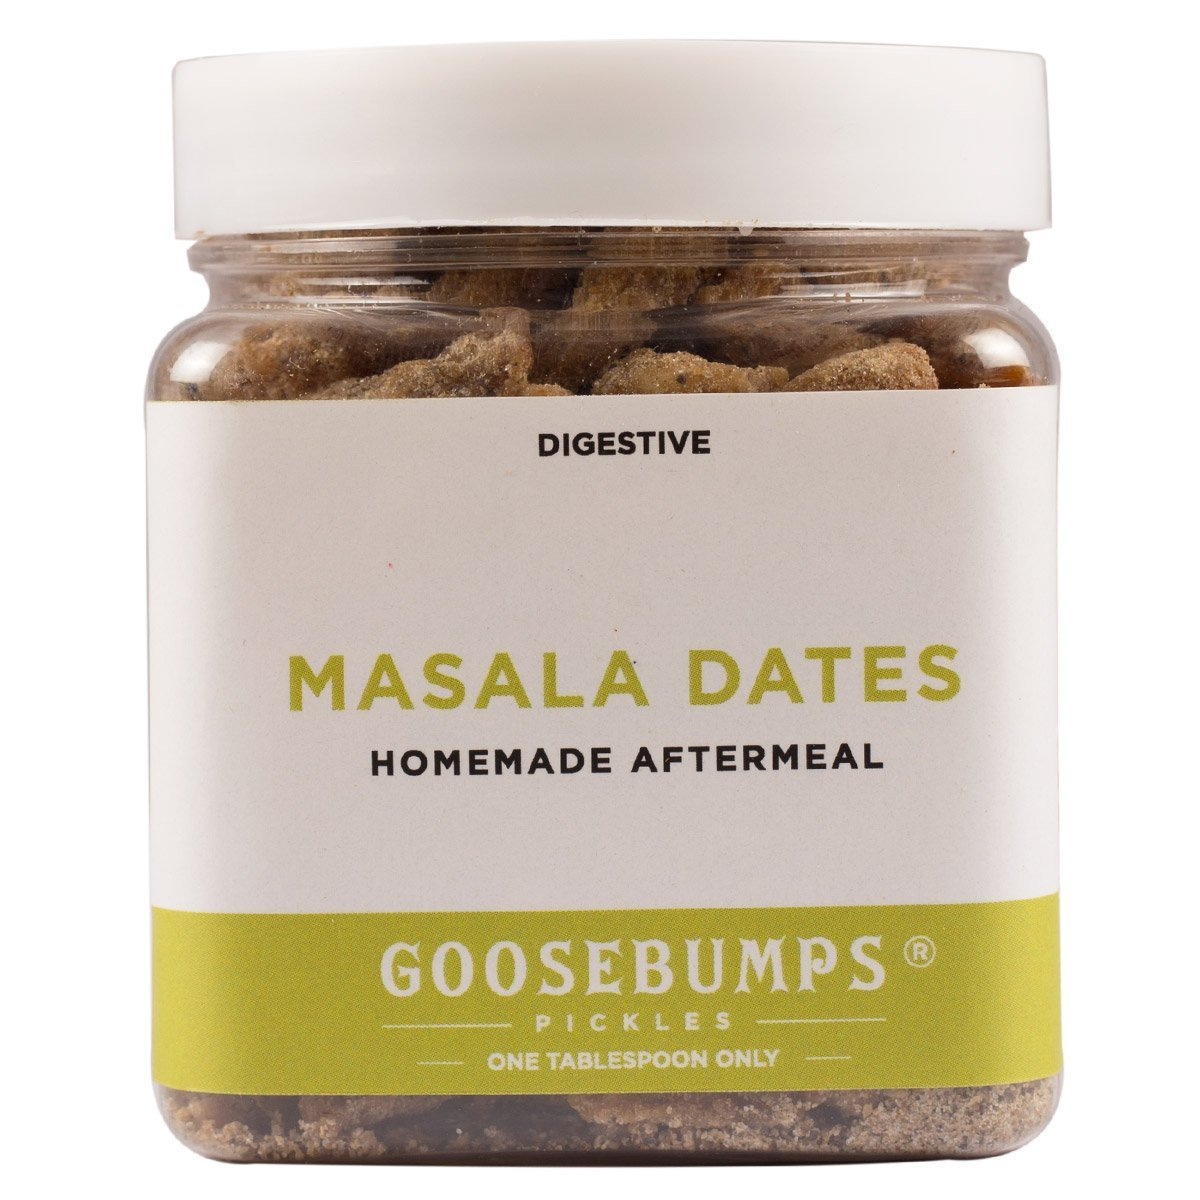 Goosebumps Pickles Homemade Masala Dates Aftermeal